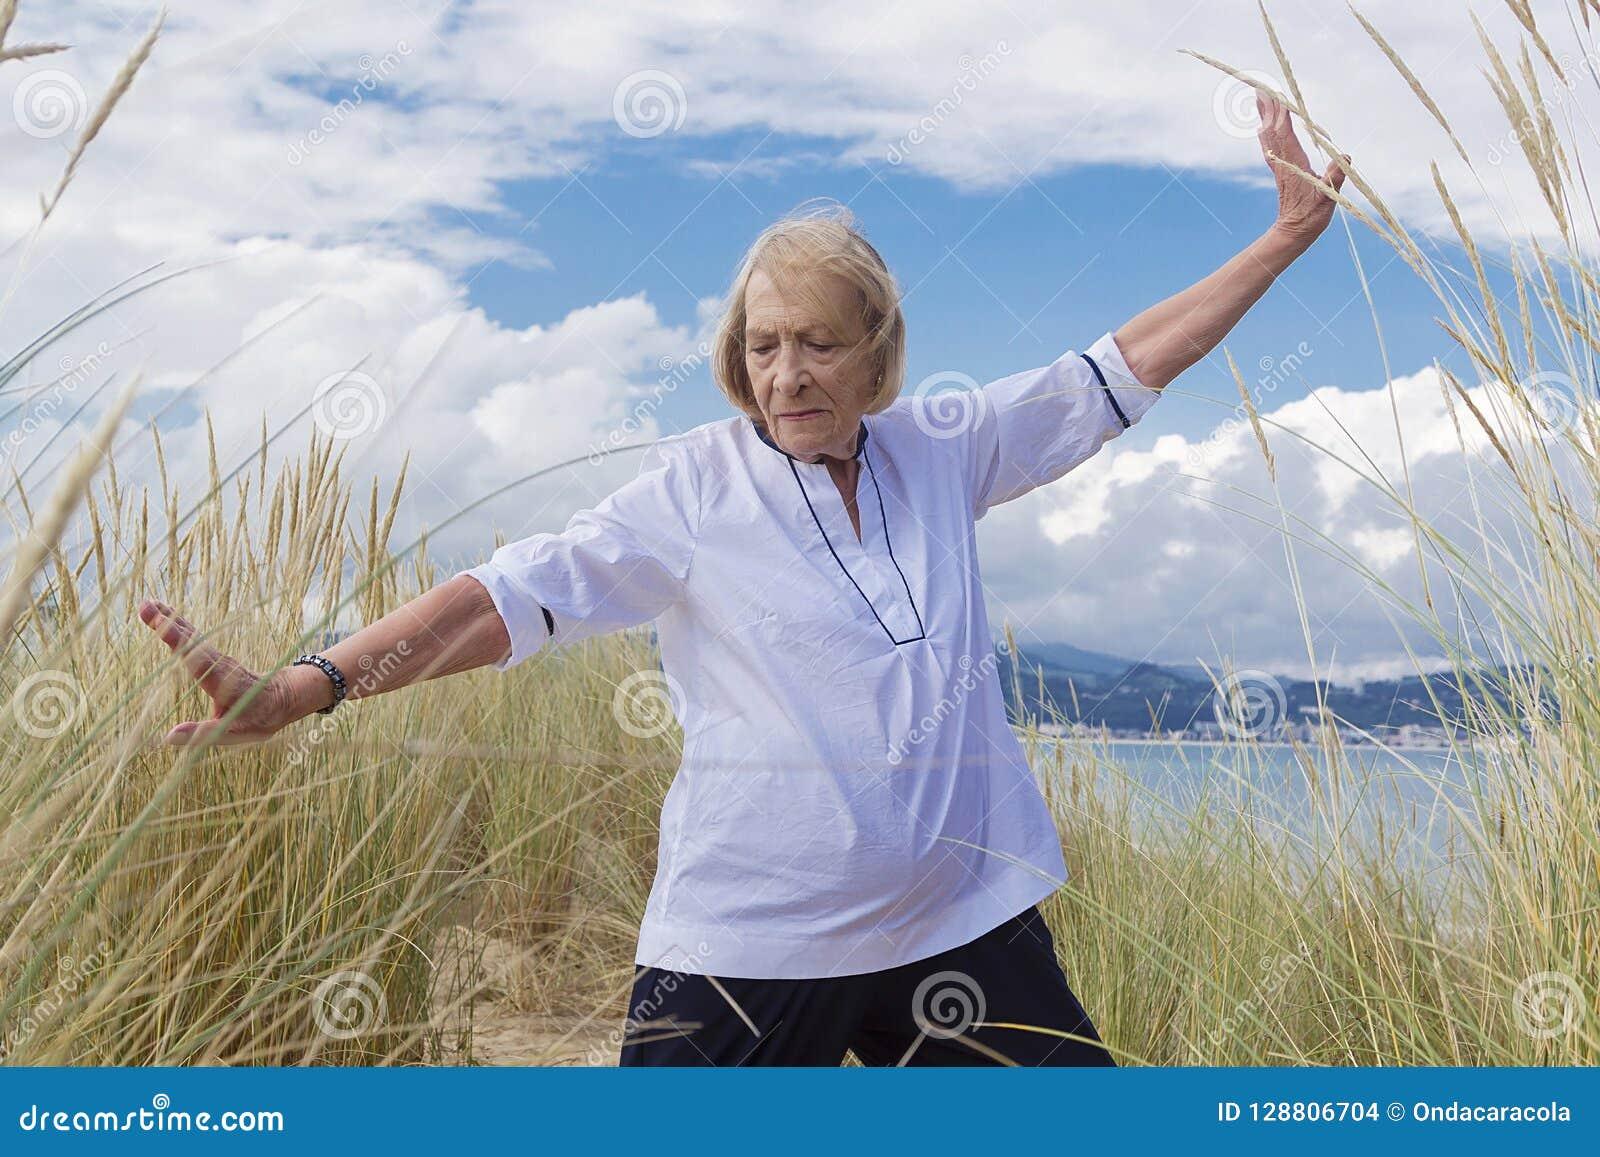 A Senior Woman Practicing Tai Chi Stock Photo - Image of